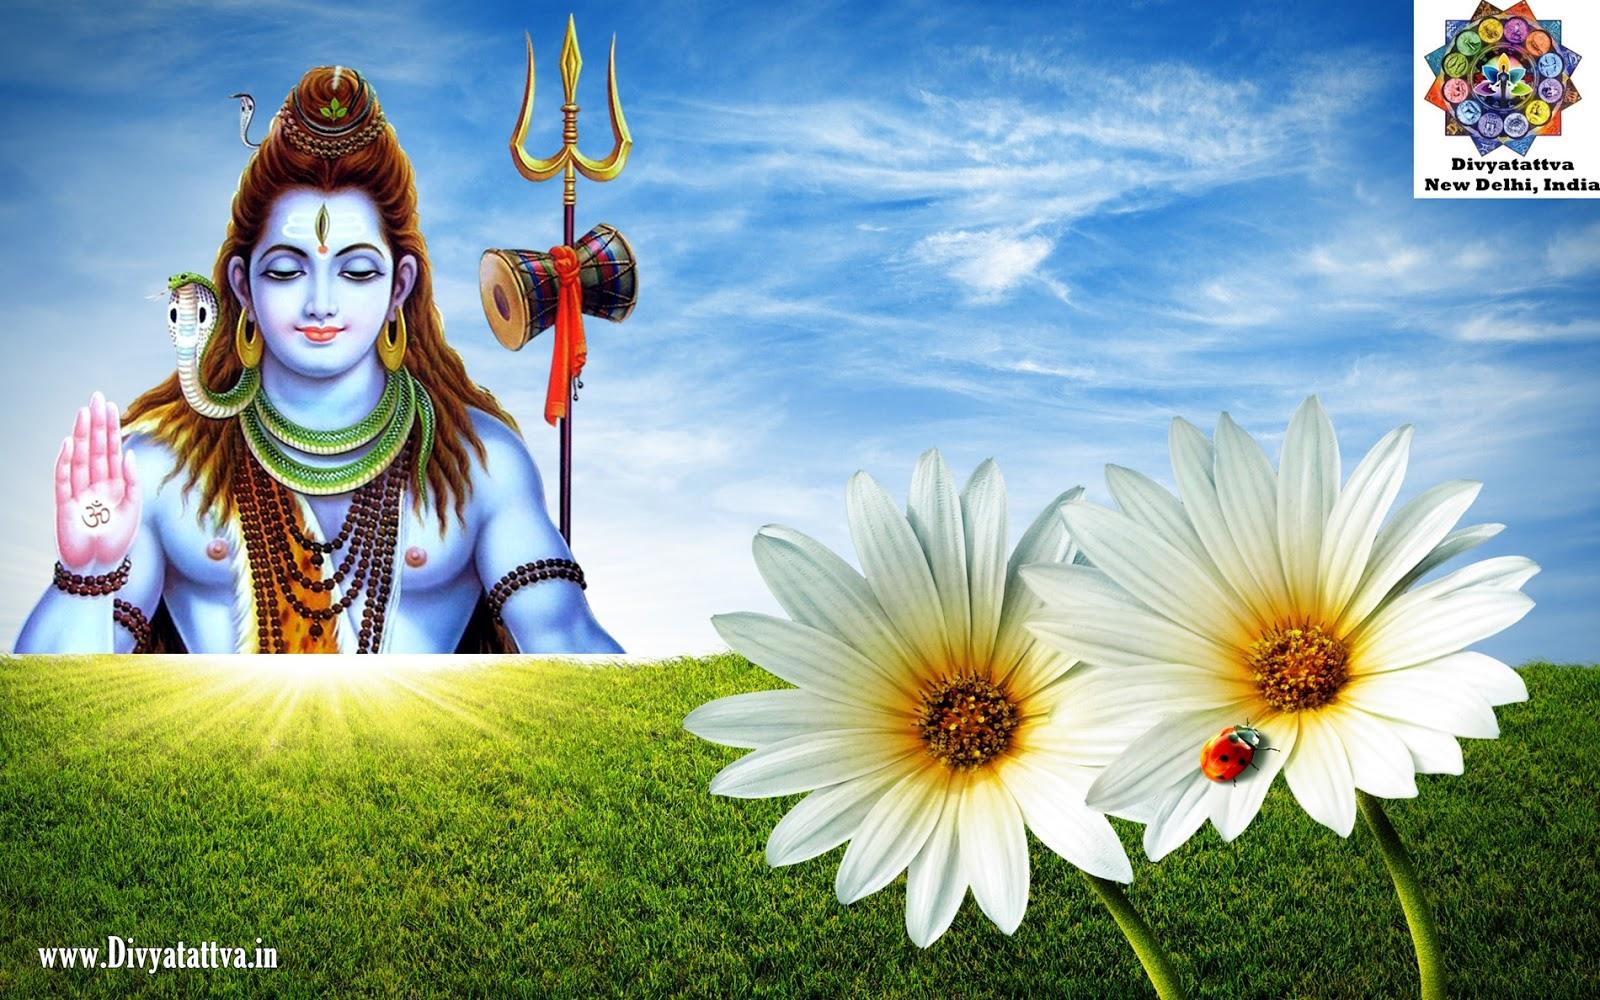 shiva pictures shivji photos hindu god indian gods wallpaper www.divyatattva.in